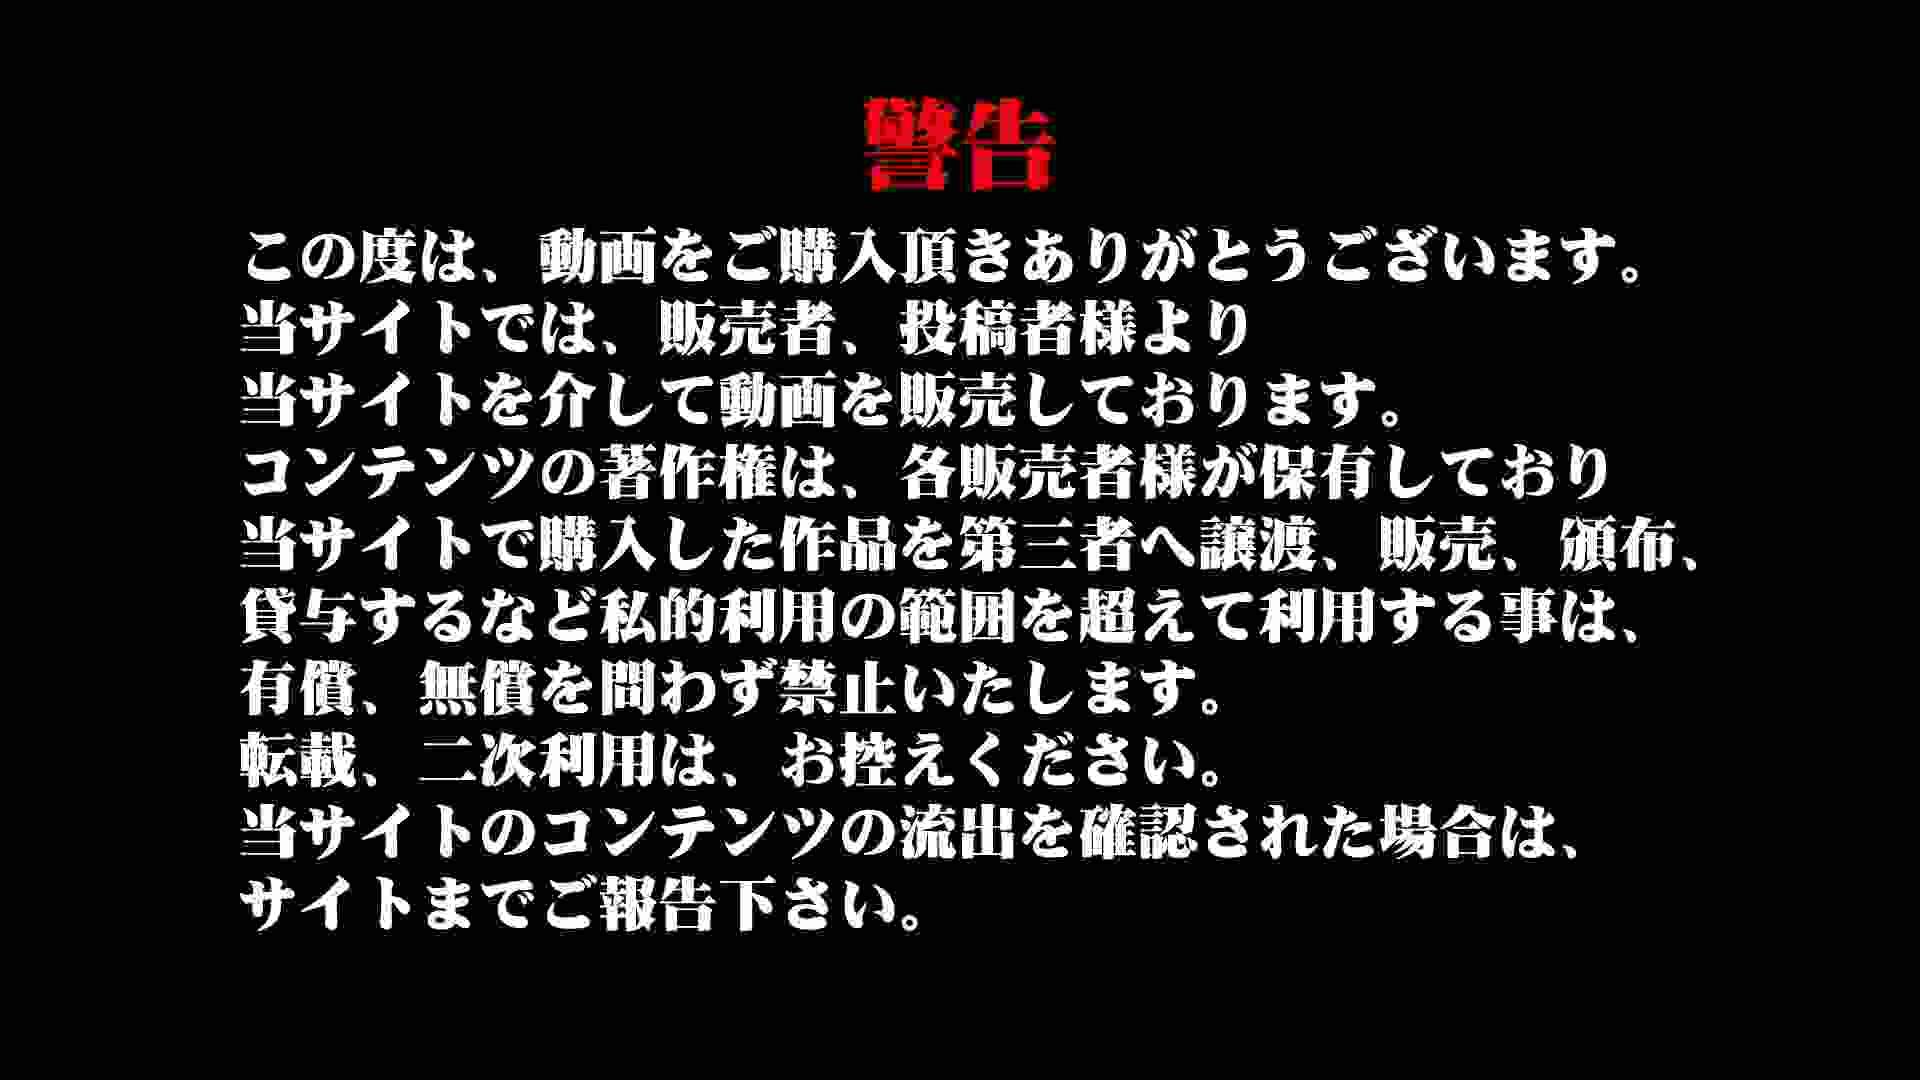 Aquaな露天風呂Vol.906 露天風呂編 | 盗撮シリーズ  86PIX 1